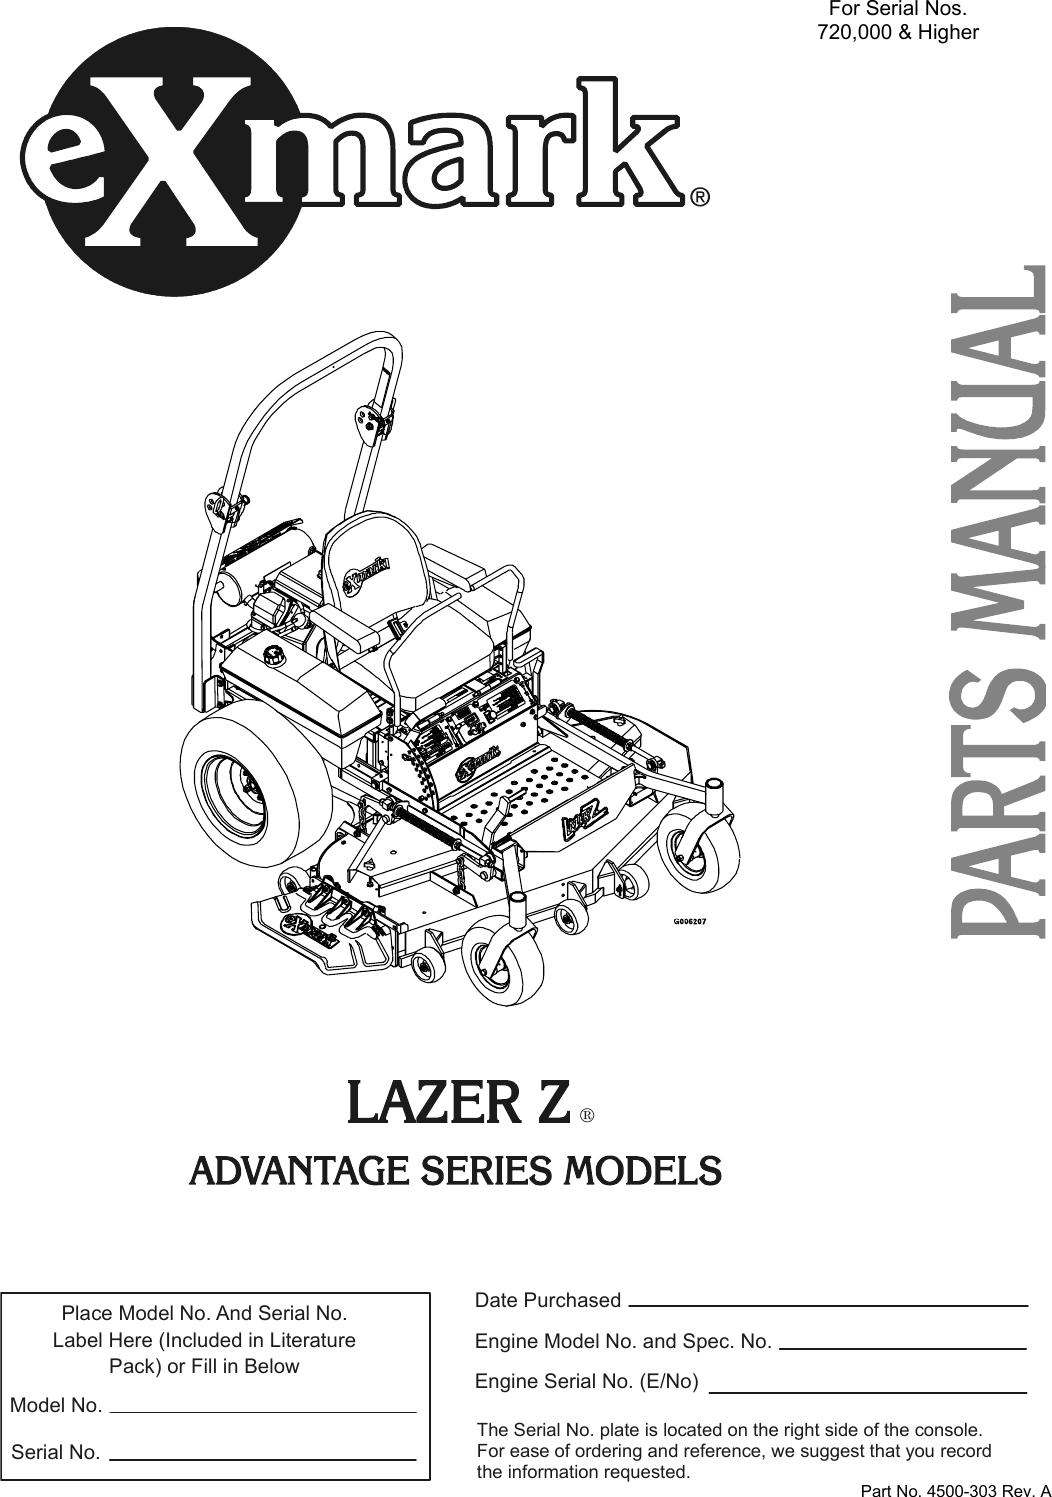 Exmark Lazer Z Advantage Series Users Manual 4500 303